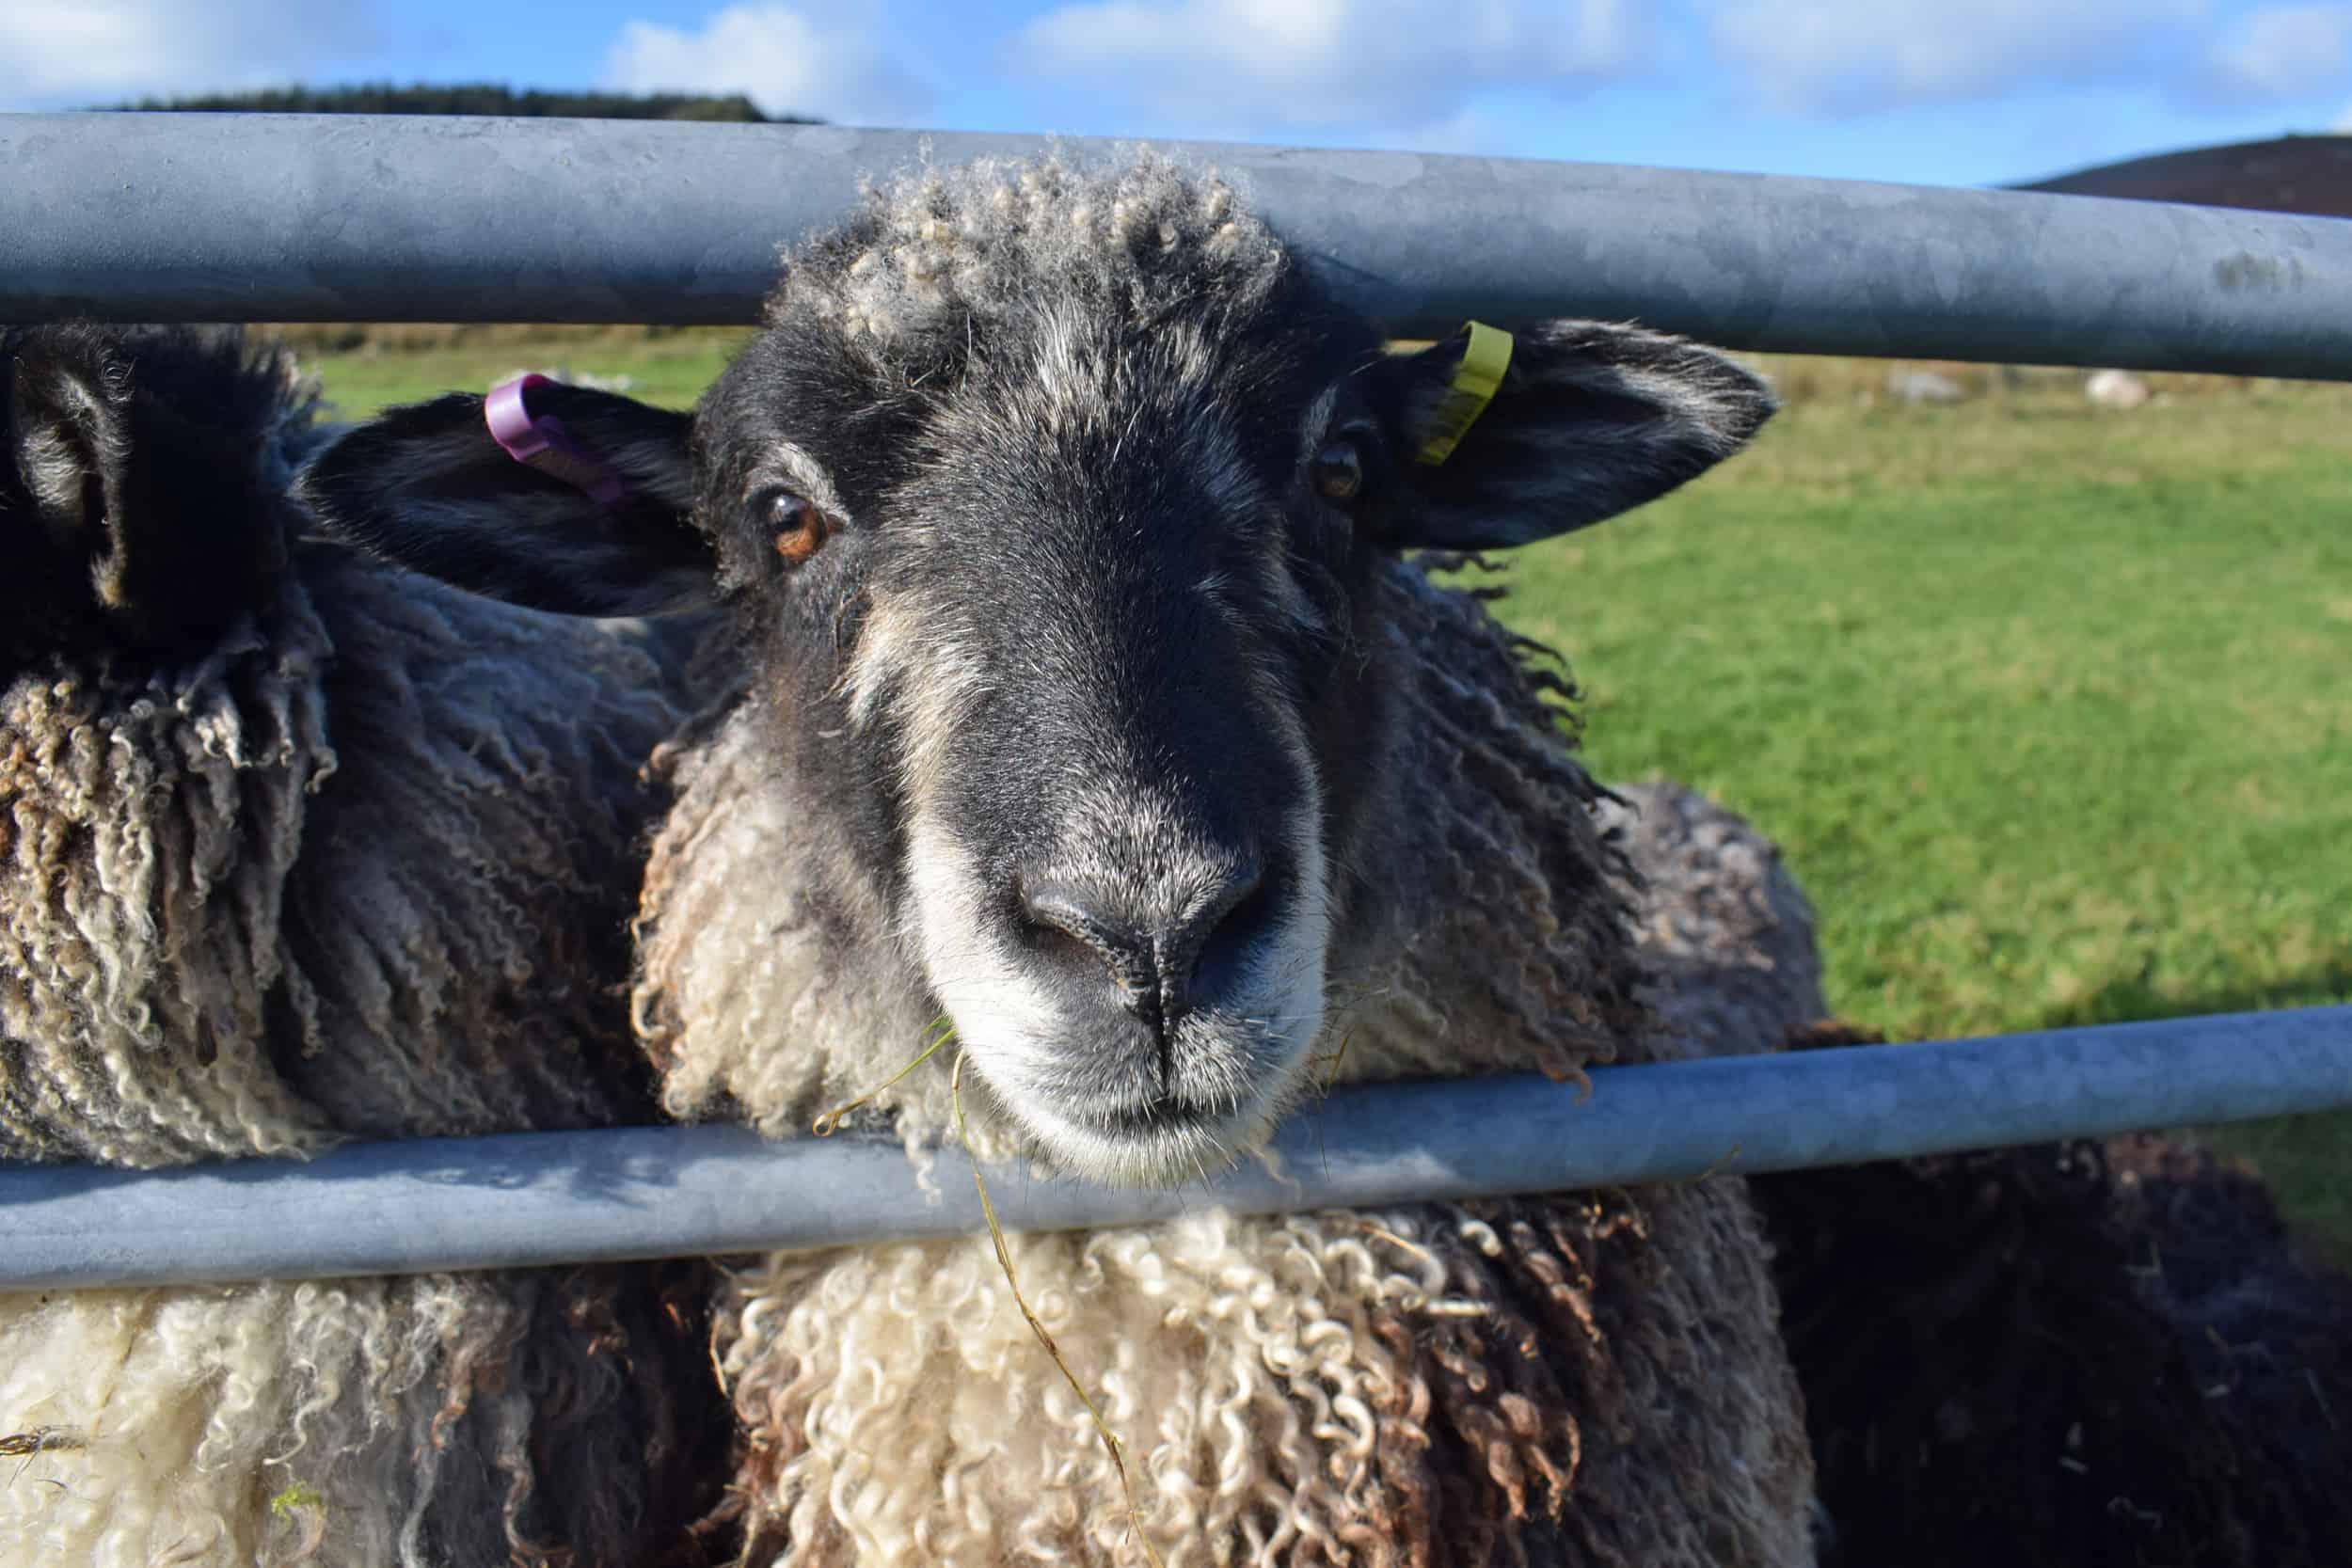 Jemima sheep farm animals coloured leicester longwool gotland sheep shetland ewe lamb kind fibre british wool grey